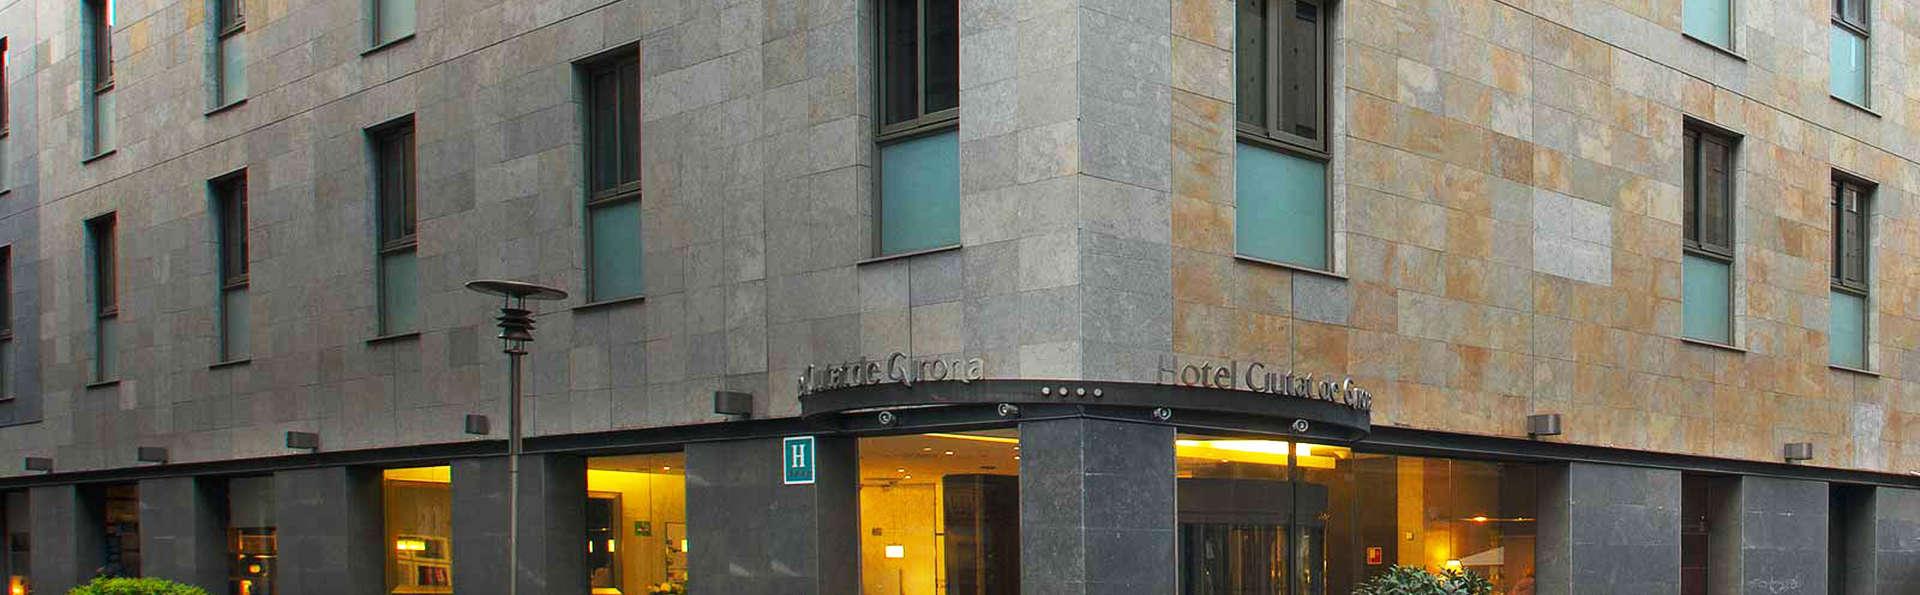 Hotel Ciutat de Girona - EDIT_front1.jpg